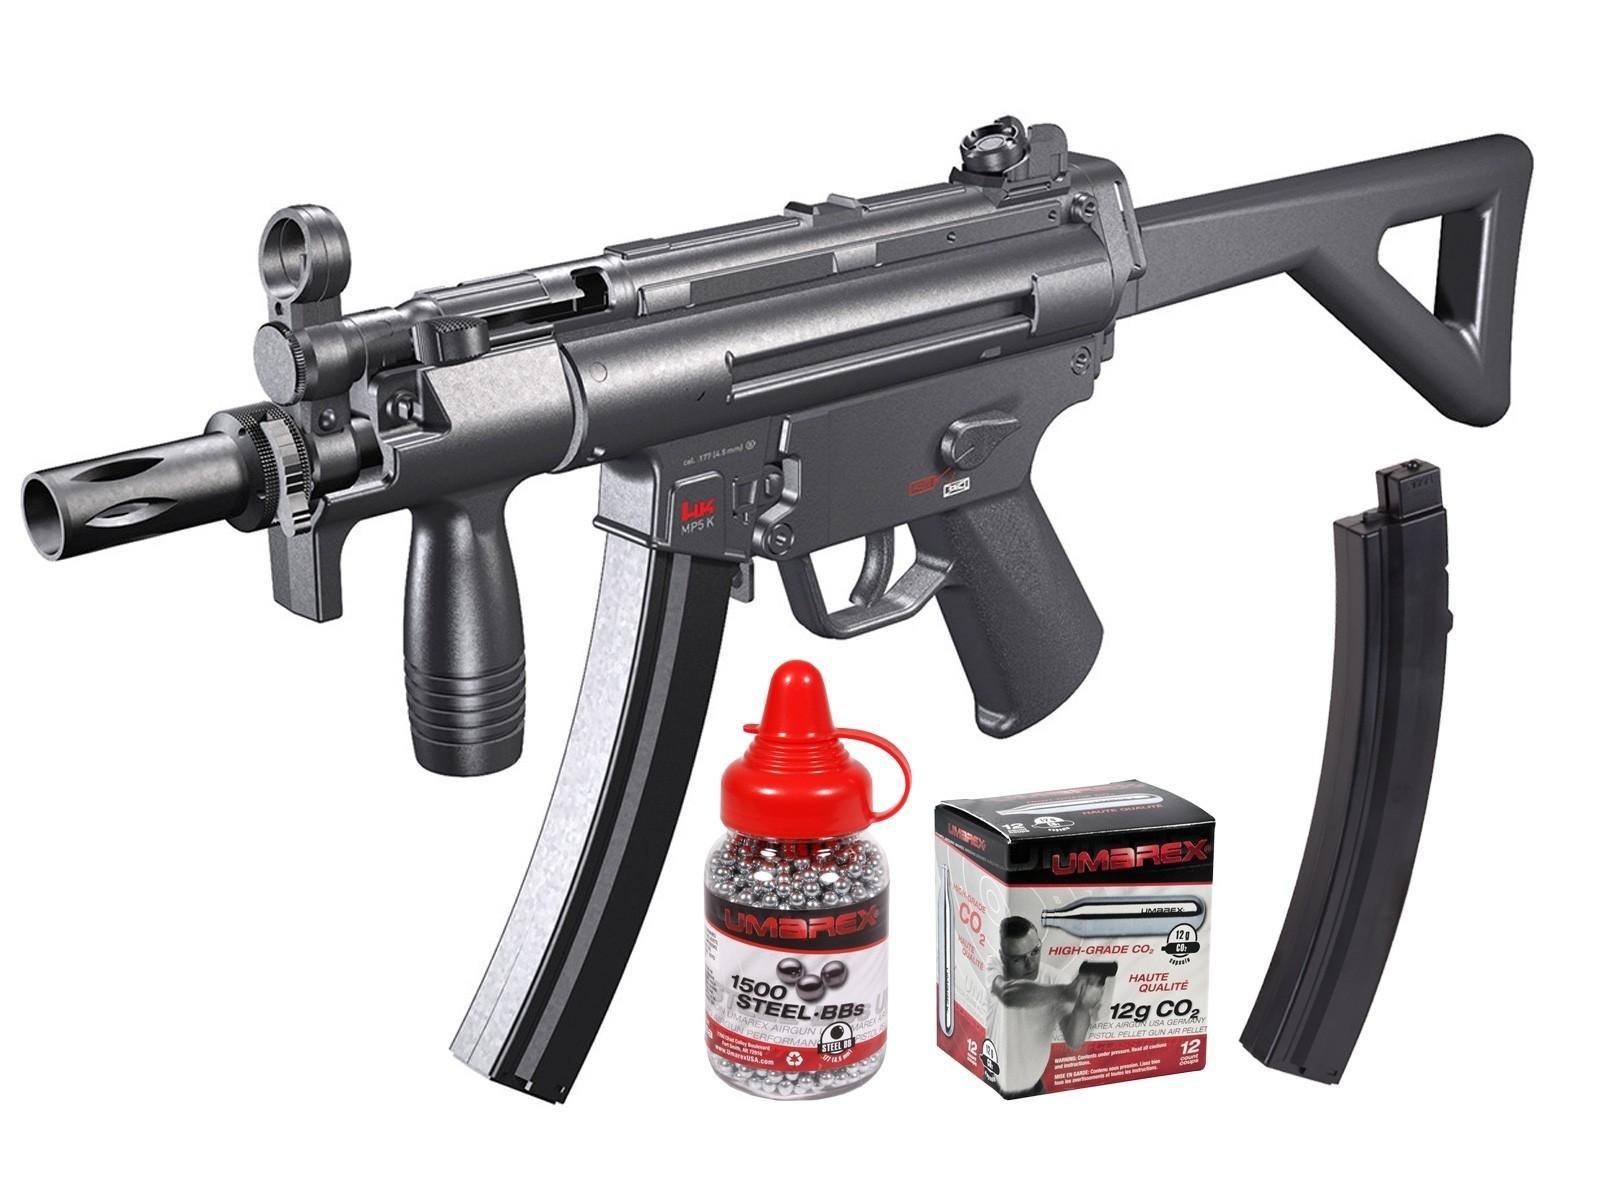 Heckler & Koch MP5 Silver Storm (H&K MP5-PDW) air rifle by Heckler & Koch